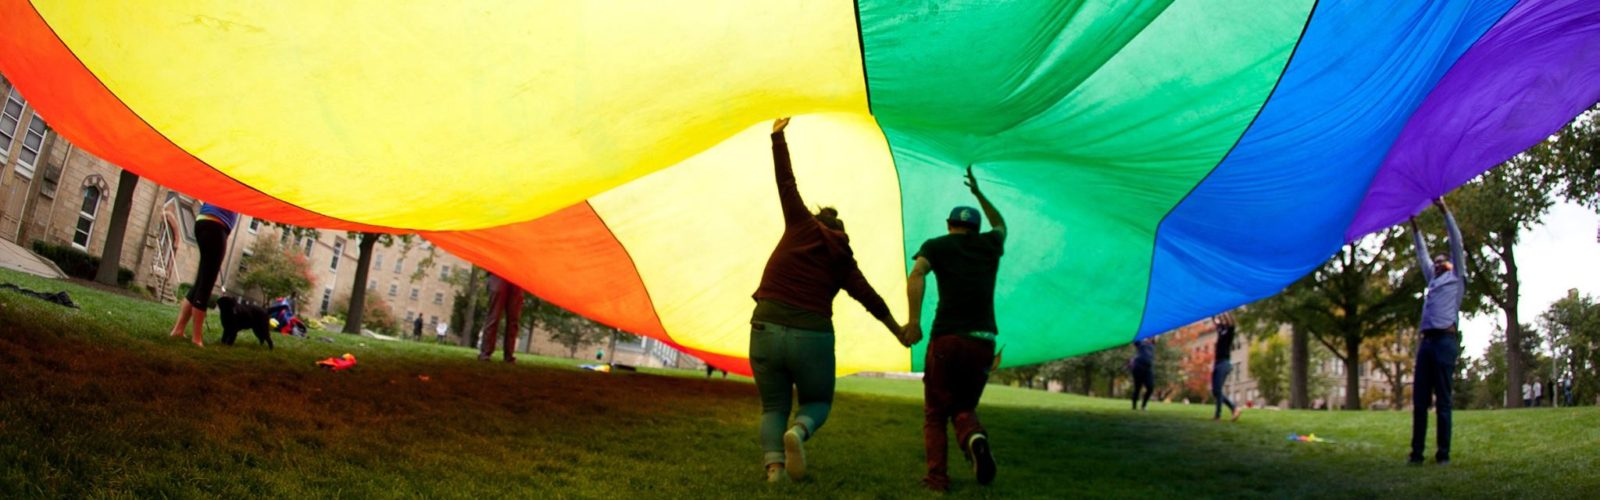 Friends under a rainbow flag